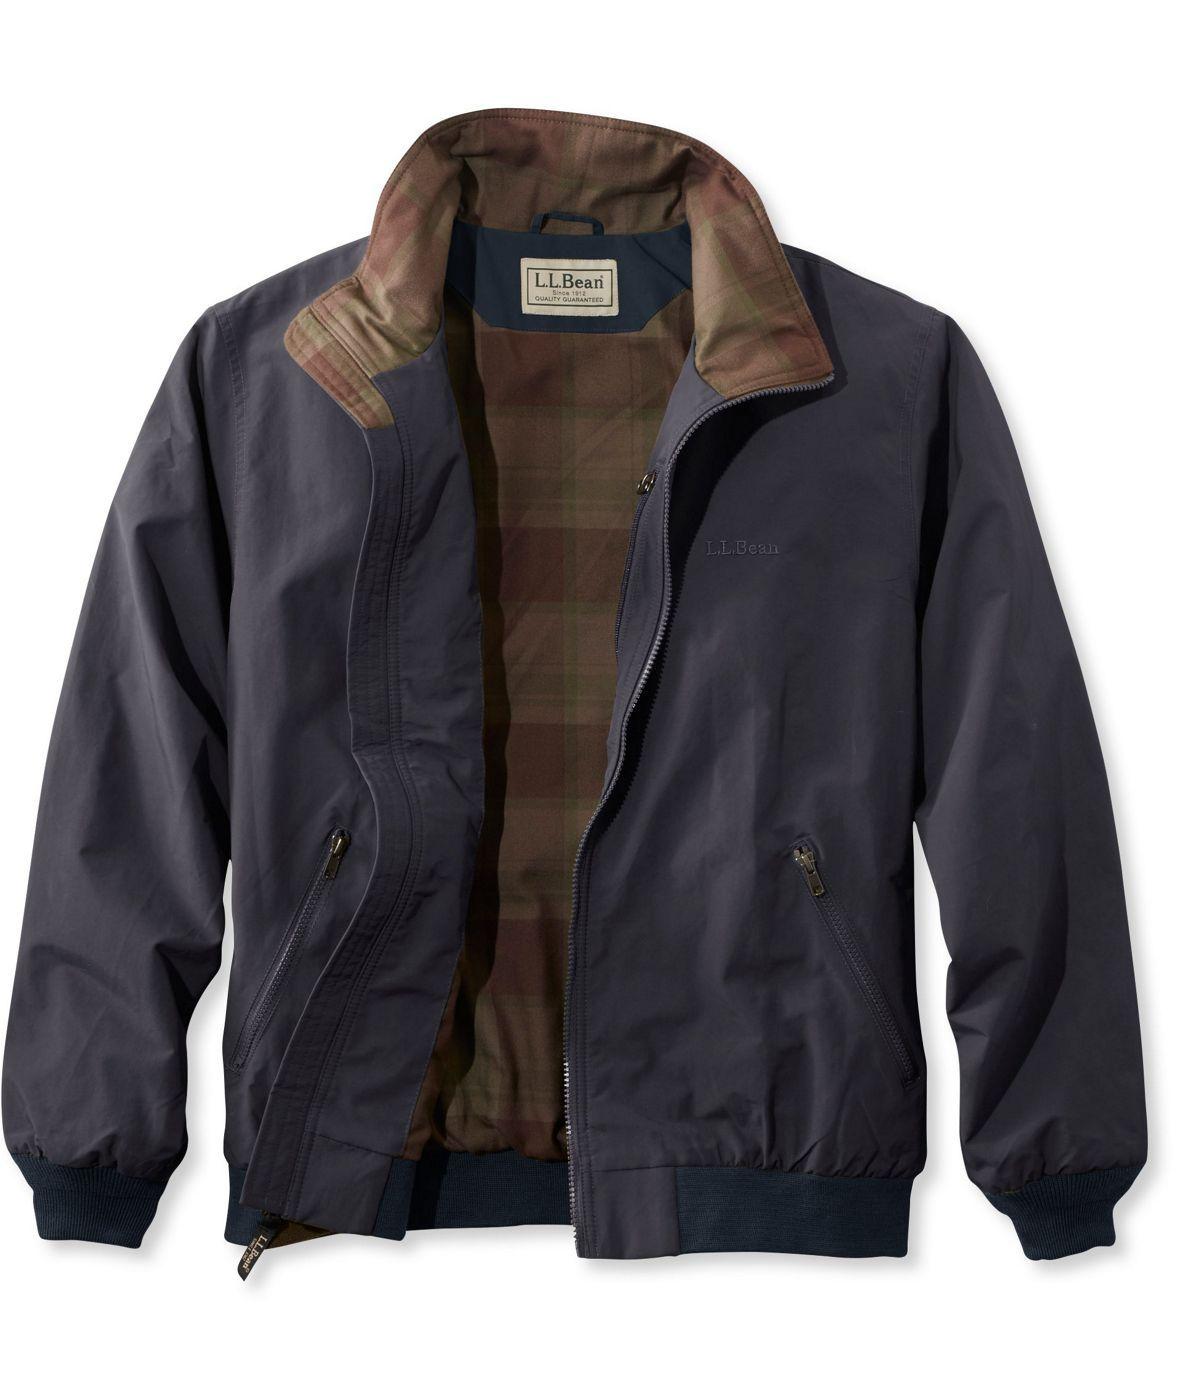 Men S Warm Up Jacket Flannel Lined In 2020 Stylish Men Casual Mens Casual Outfits Stylish Mens Outfits [ 1383 x 1200 Pixel ]